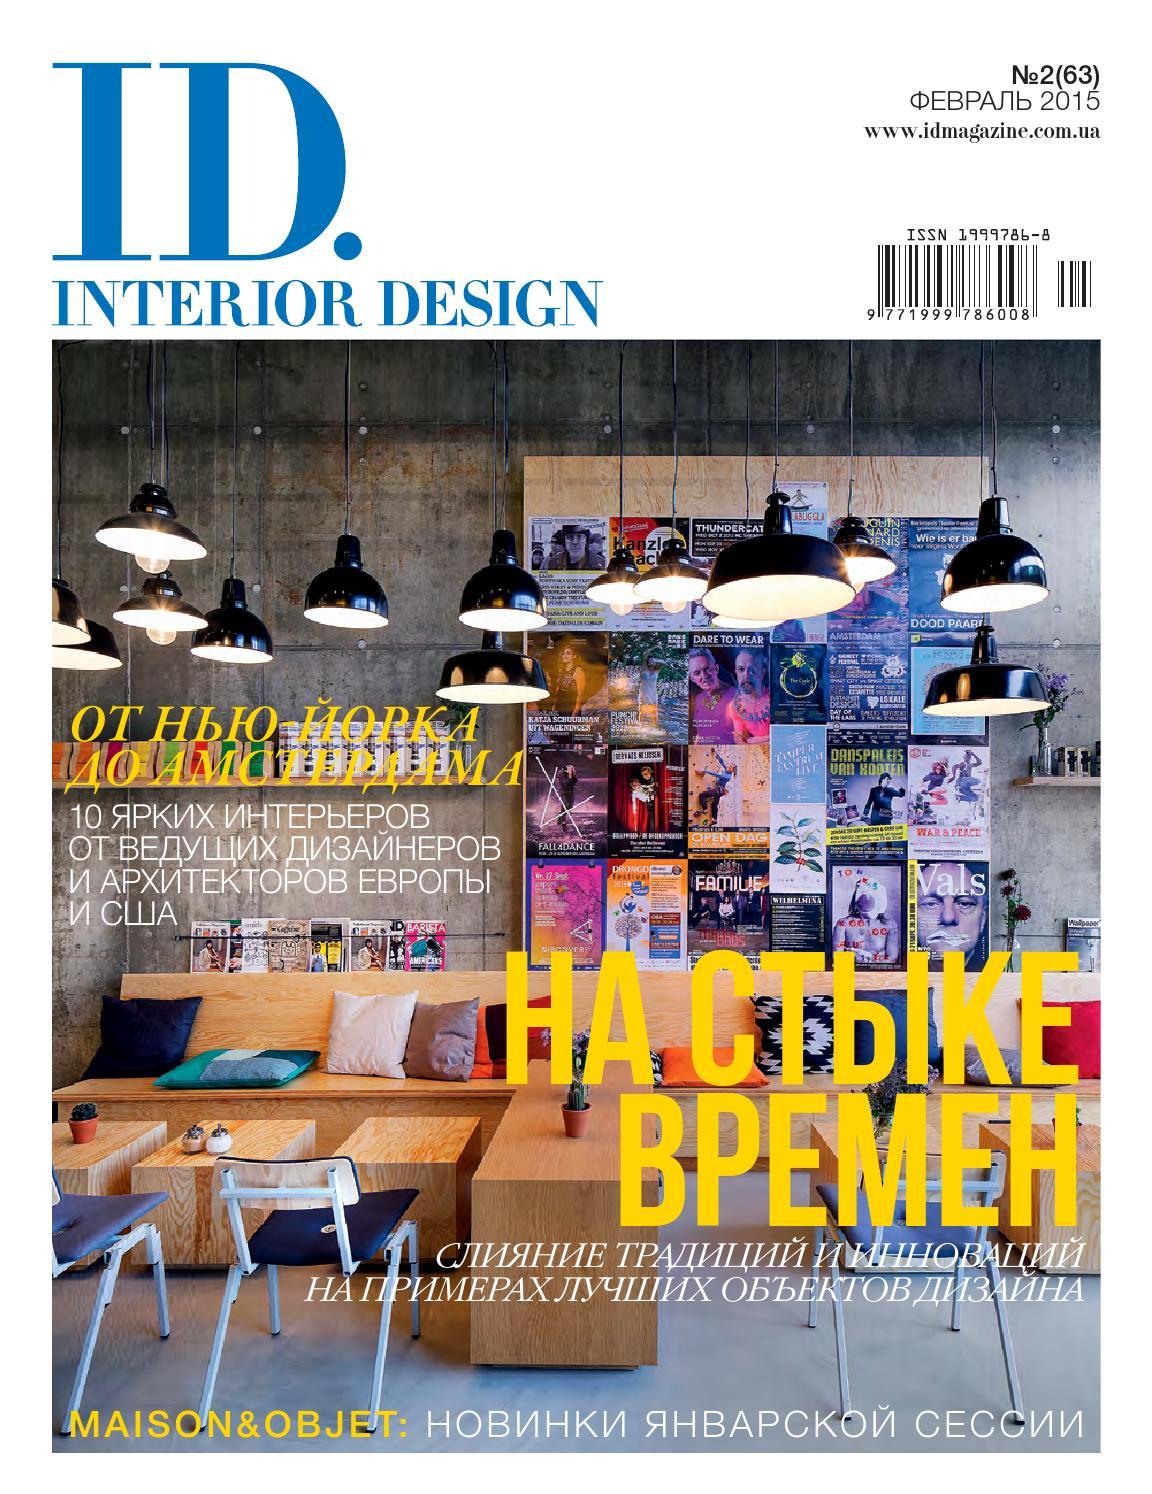 id interior design 63 by id magazine issuu. Black Bedroom Furniture Sets. Home Design Ideas